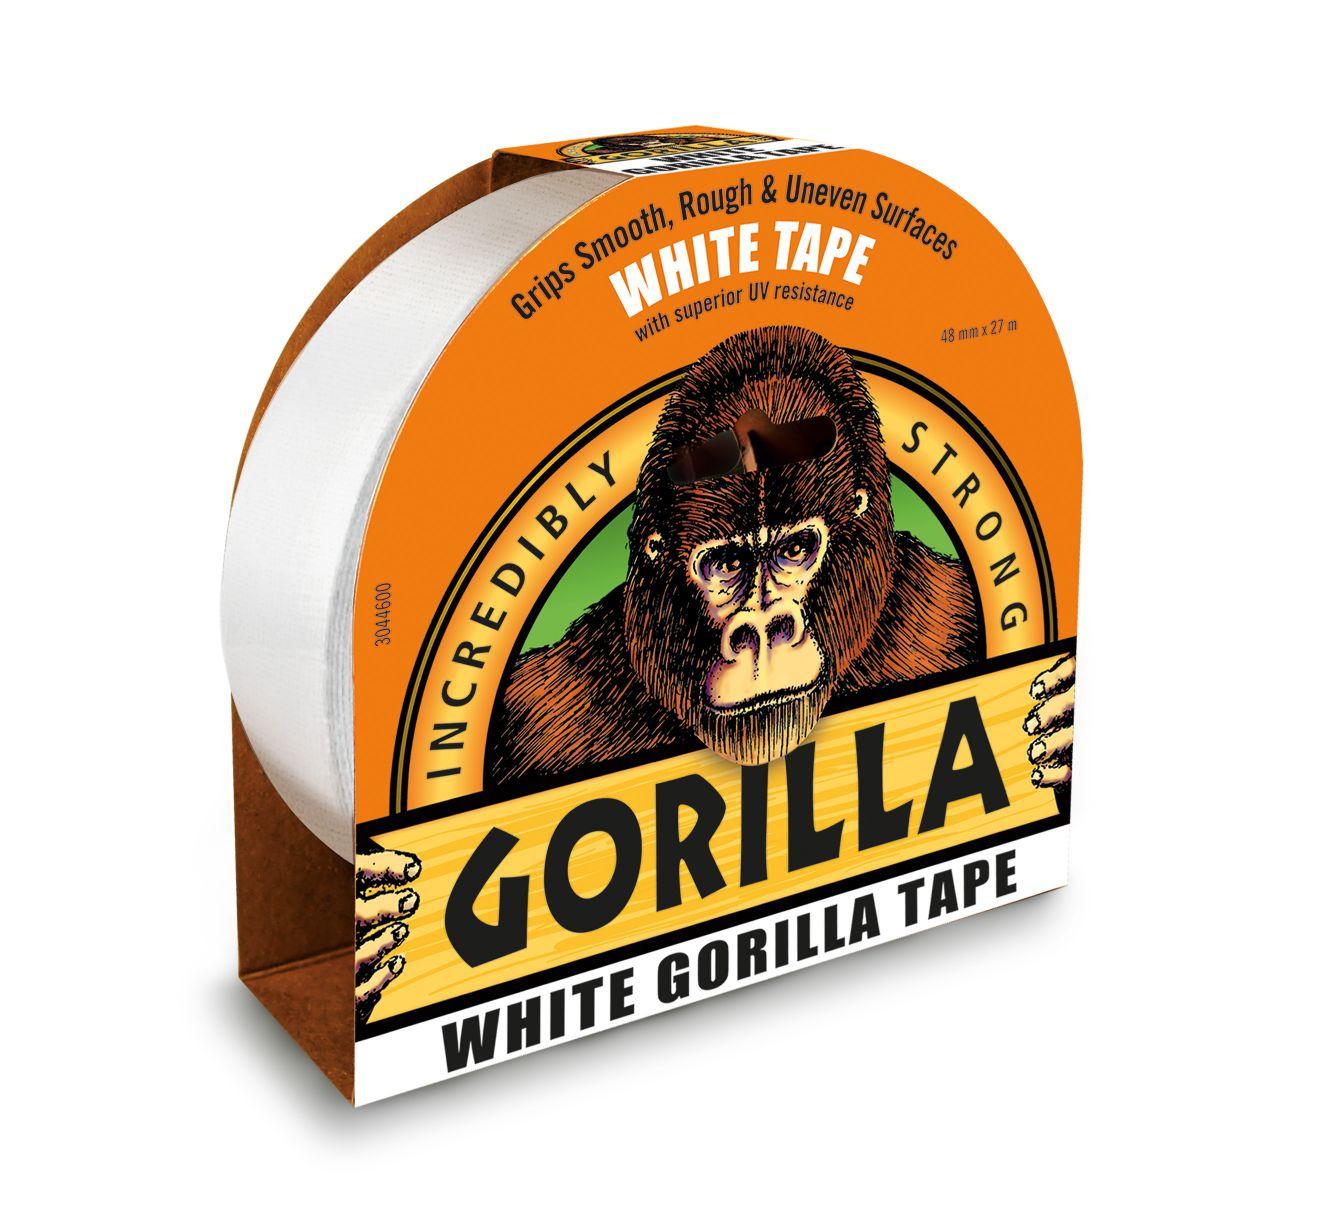 GORILLA WHITE DUCT TAPE 48 X 27M